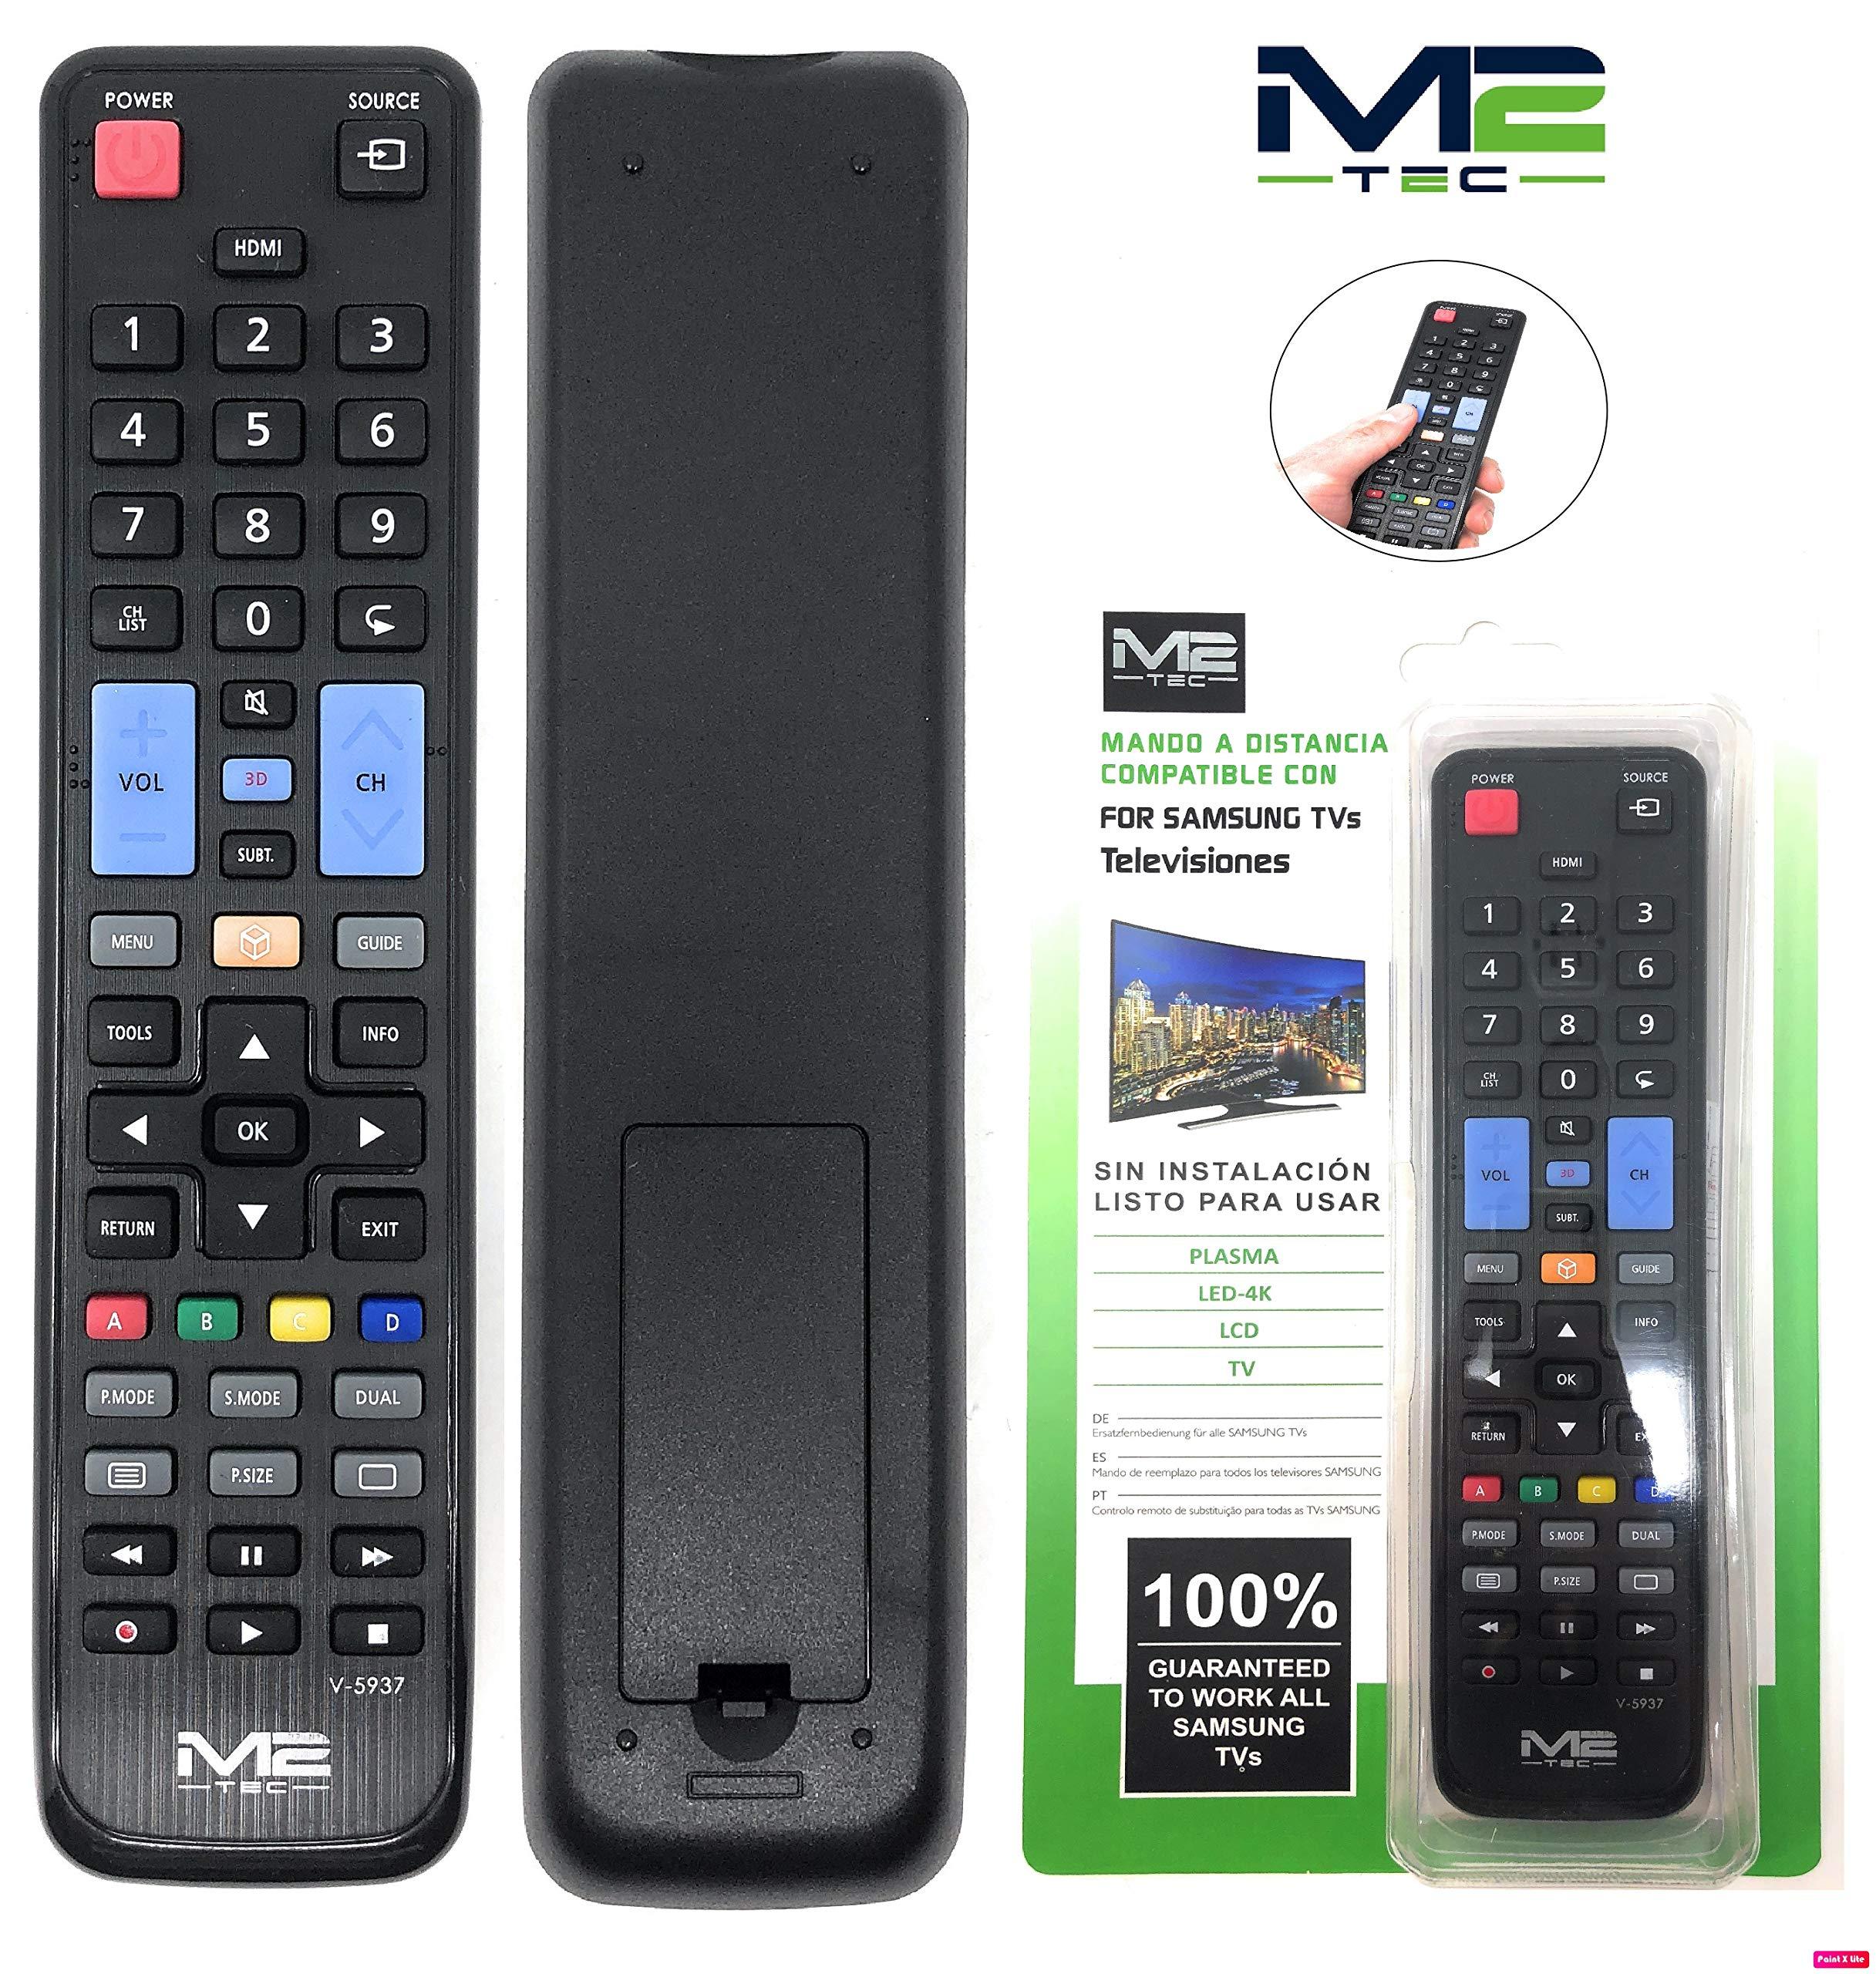 Mando a Distancia para Todos los televisores Samsung I Repuesto I Control Remoto I Televisor I Universal I LCD LED Plasma: Amazon.es: Electrónica